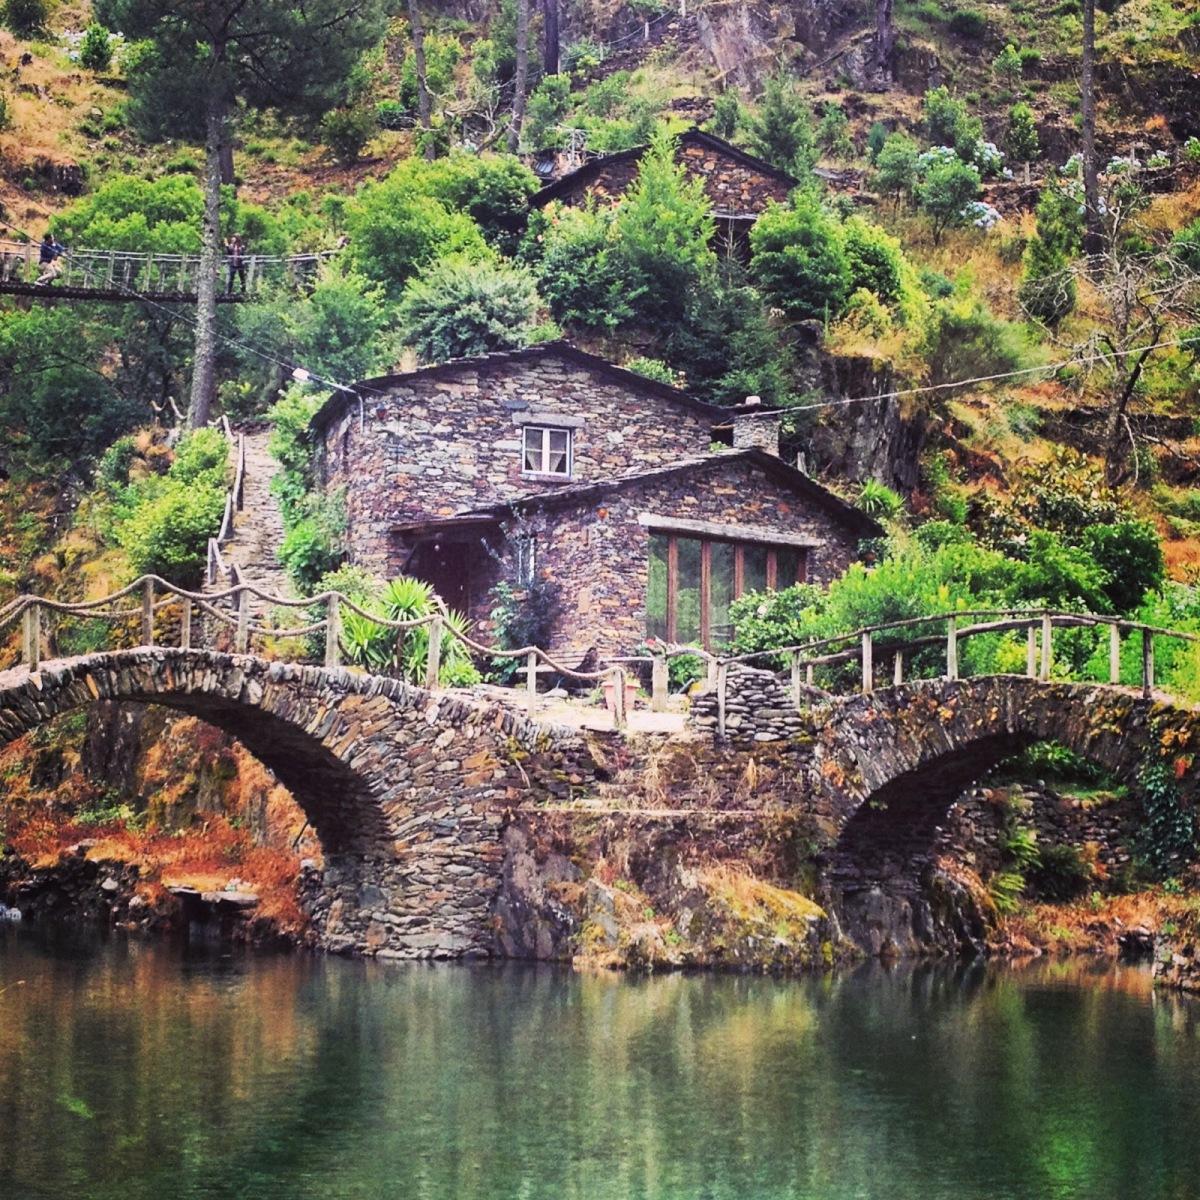 aldeias de xisto